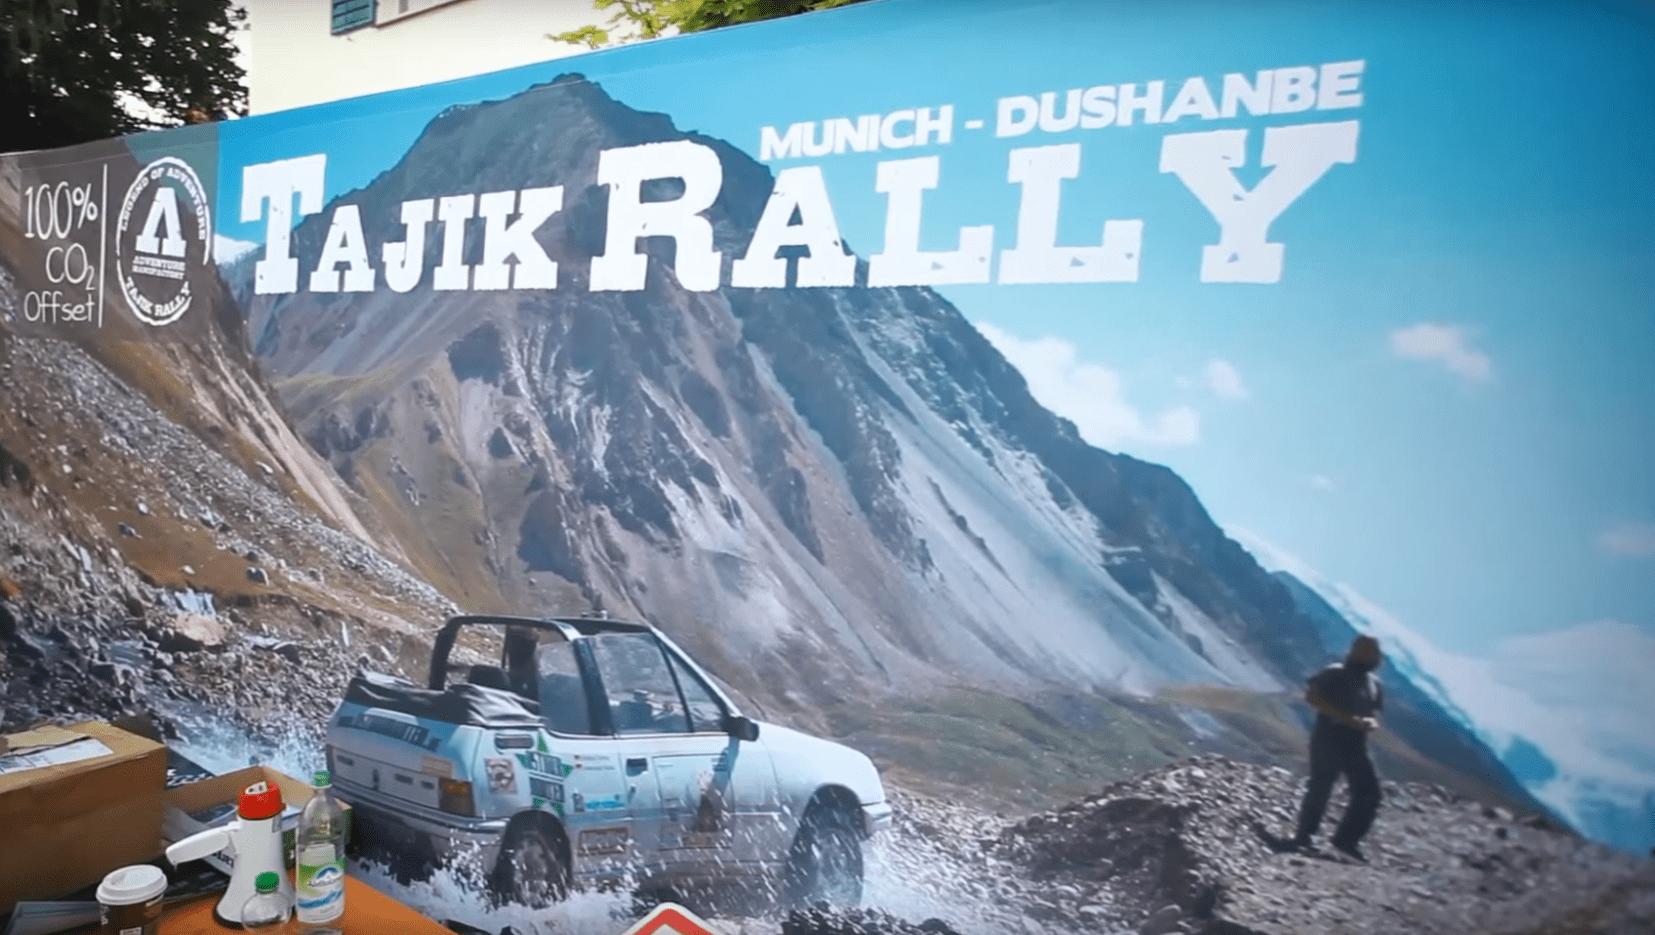 Tajik Rally - Official Trailer